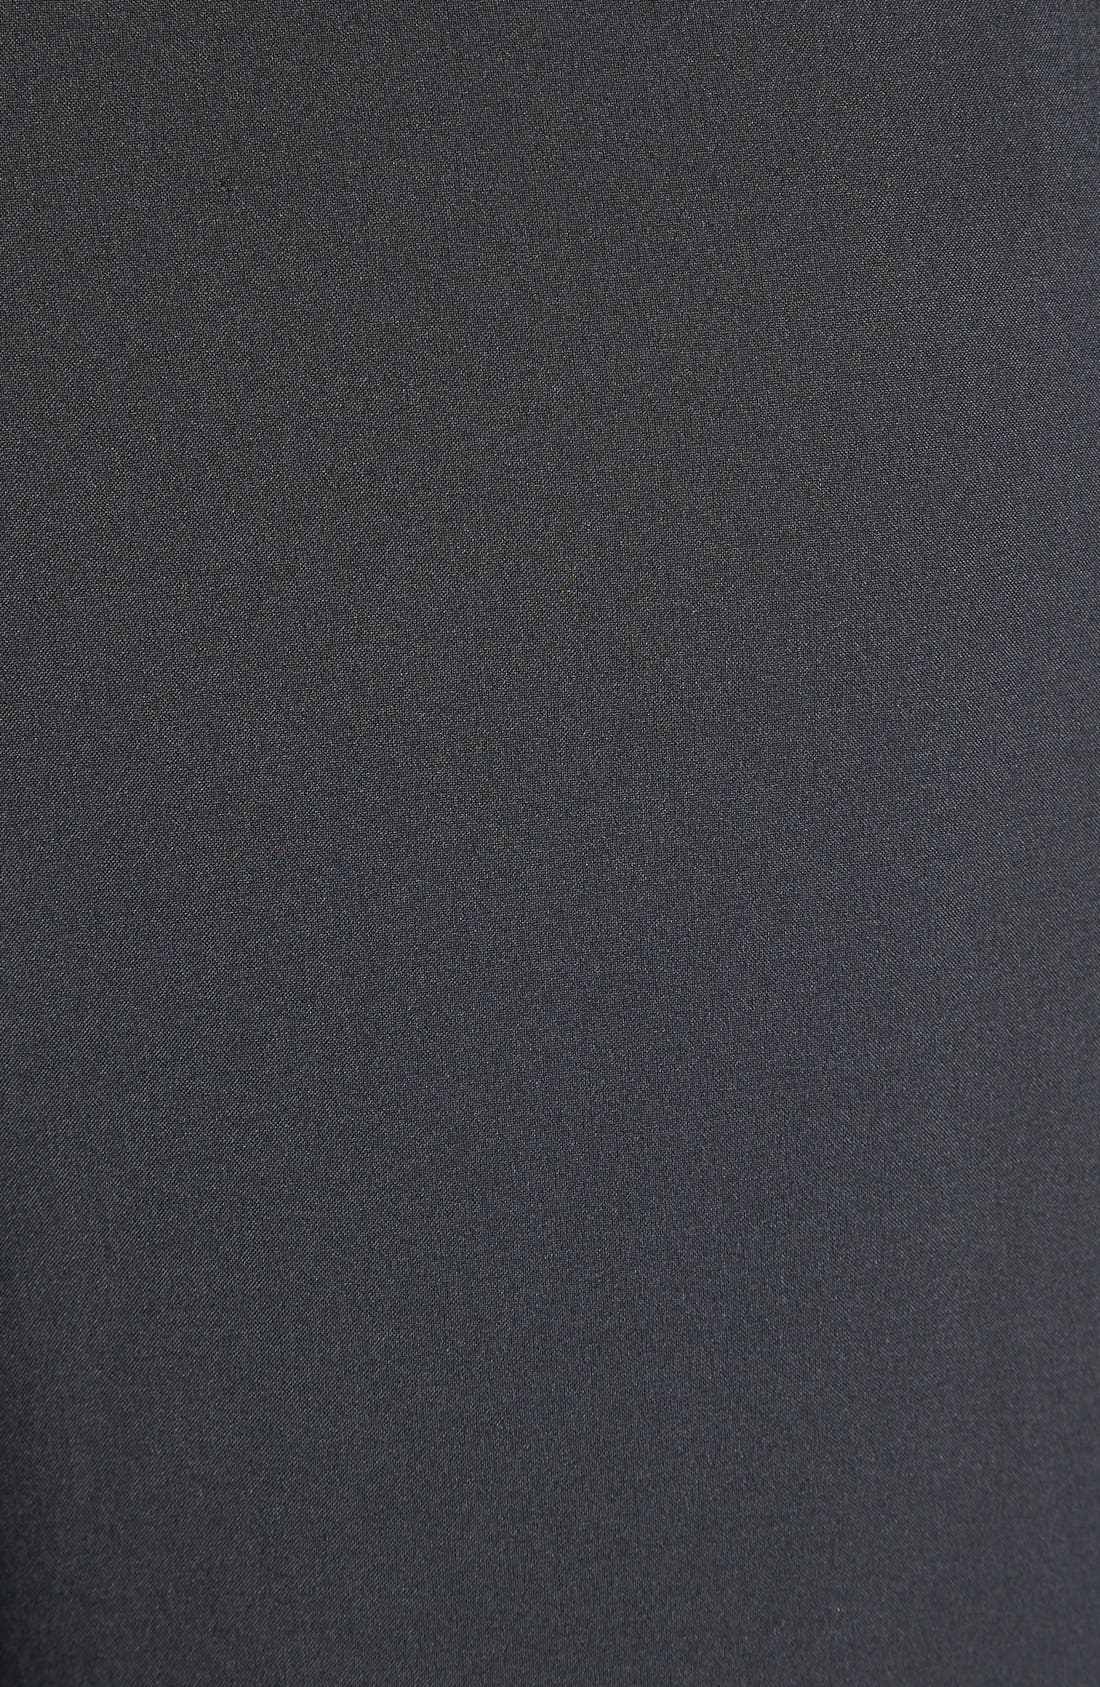 Alternate Image 3  - Nike 'Dri-FIT SW' Stretch Woven Pants